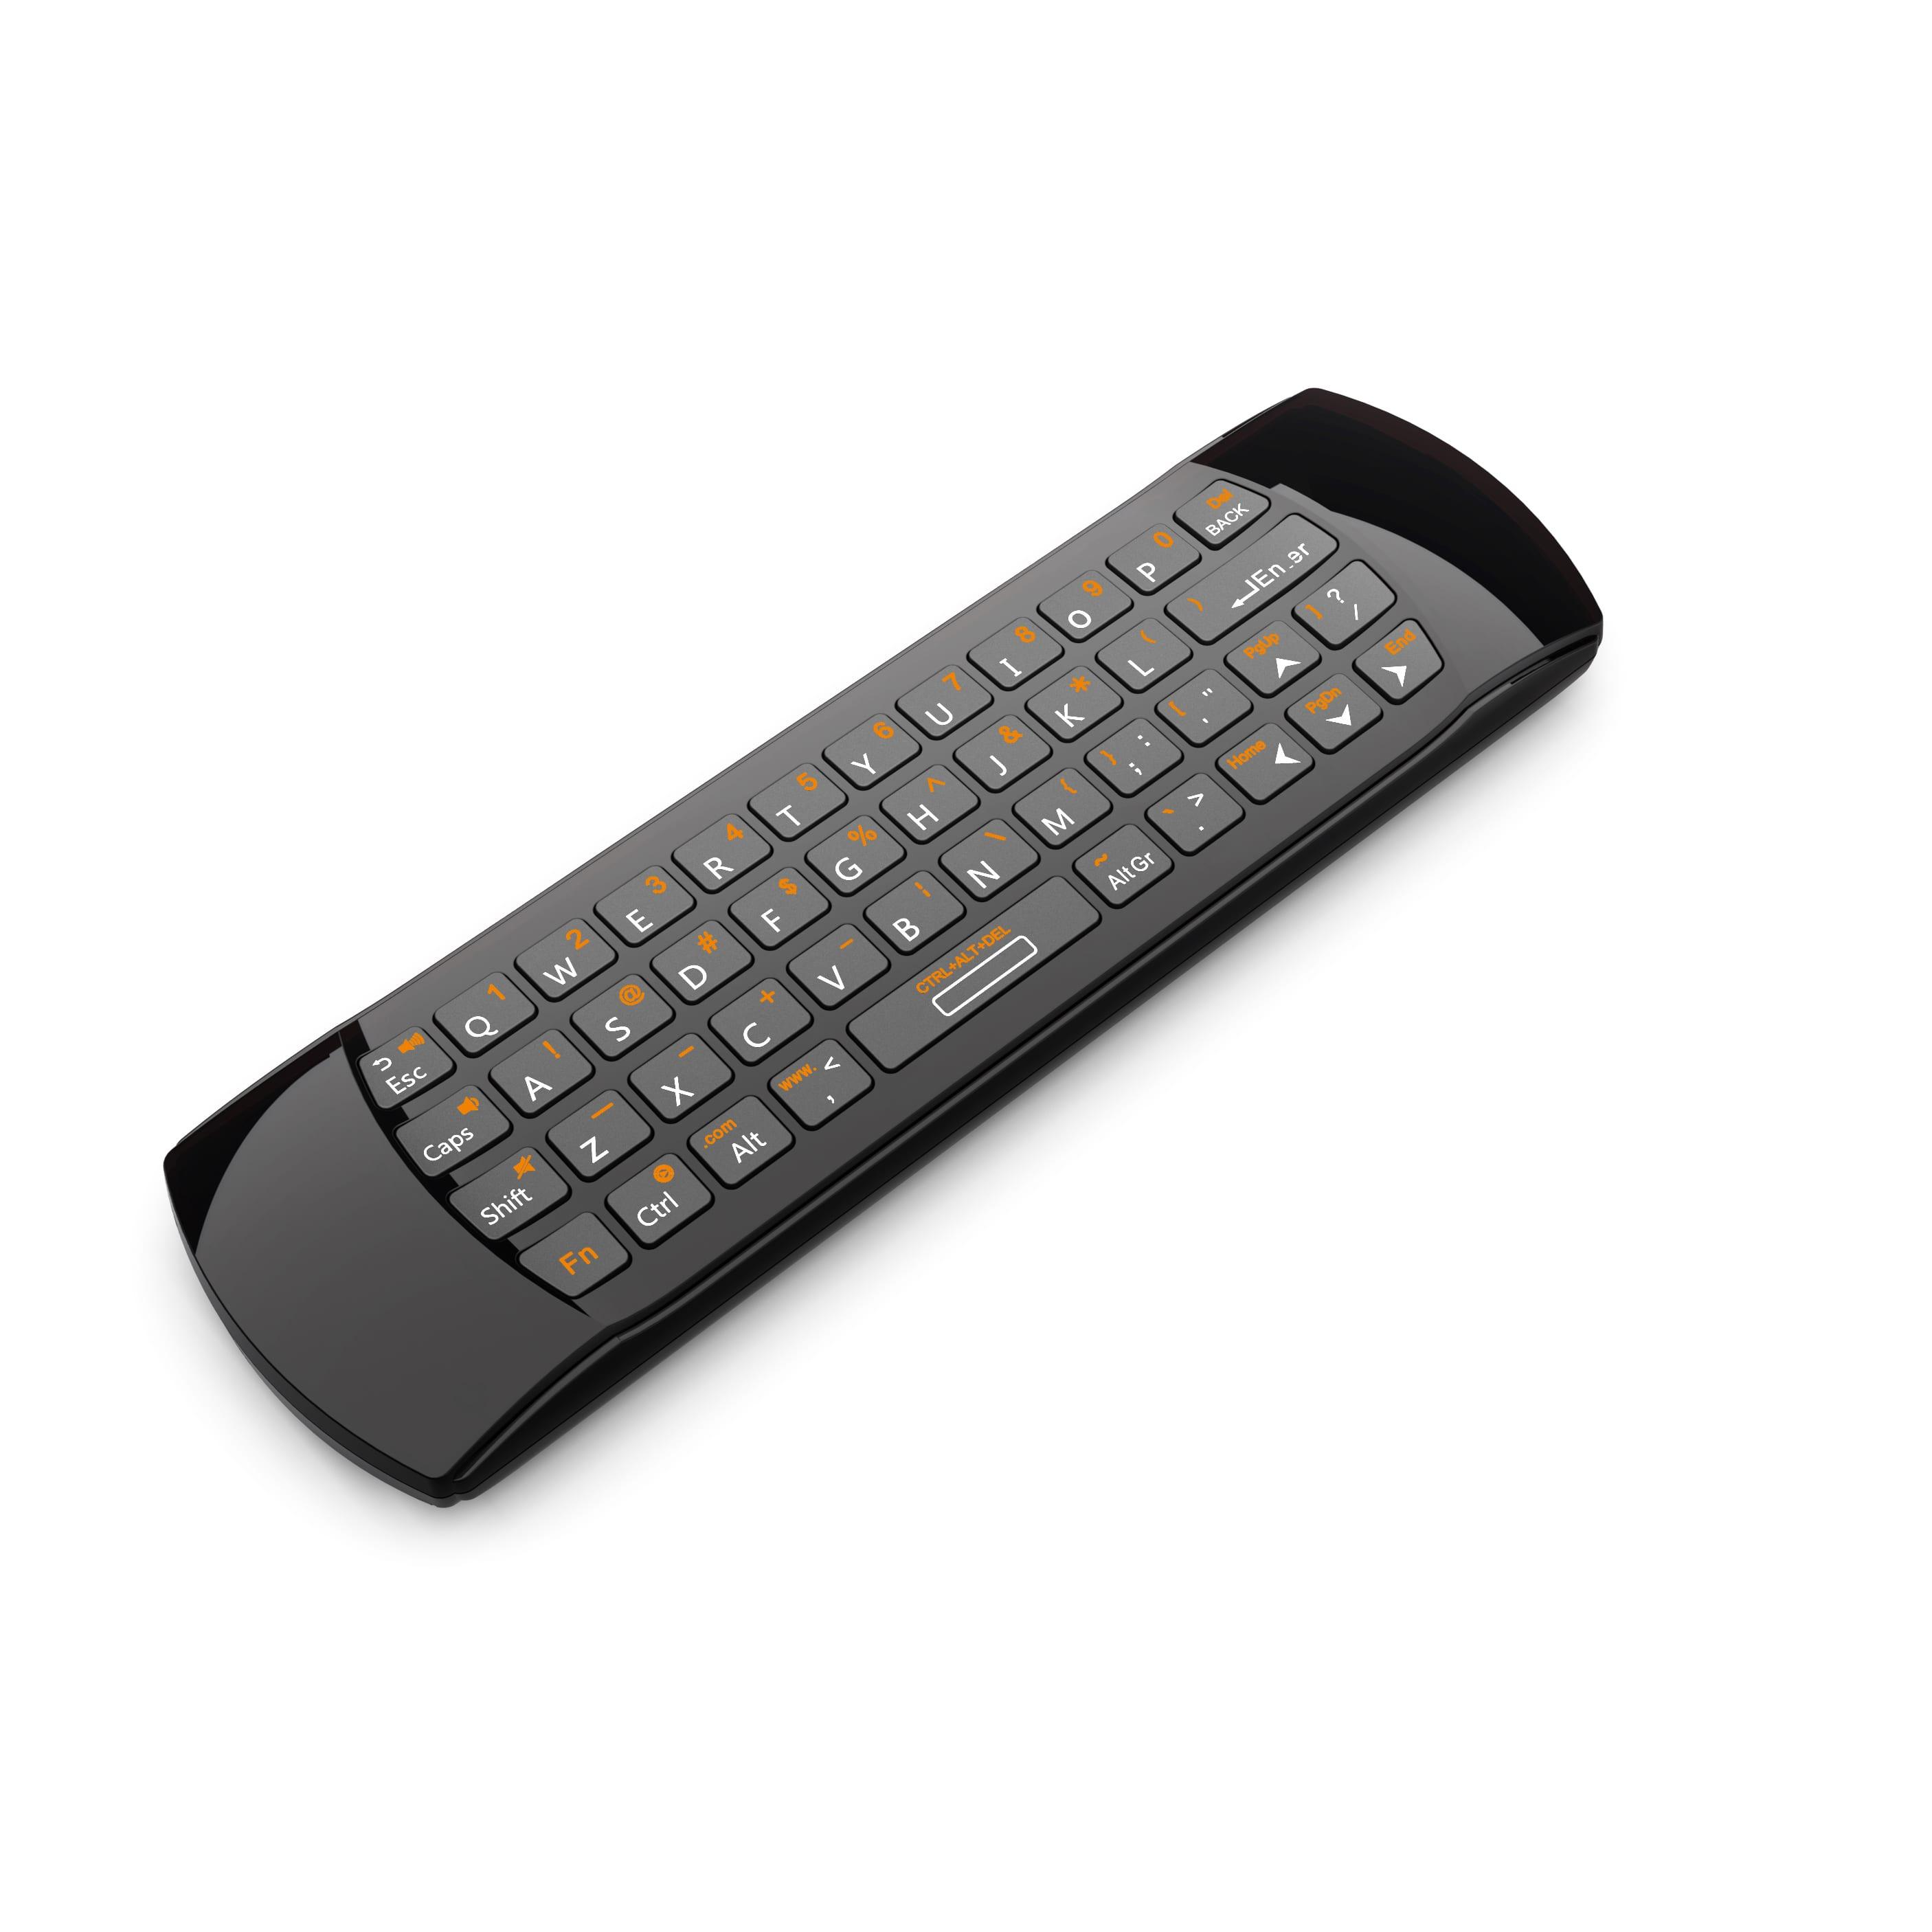 f798e038fa6 Rii Wireless QWERTY Air Mouse Dual-Sided IR Remote Keyboard Black